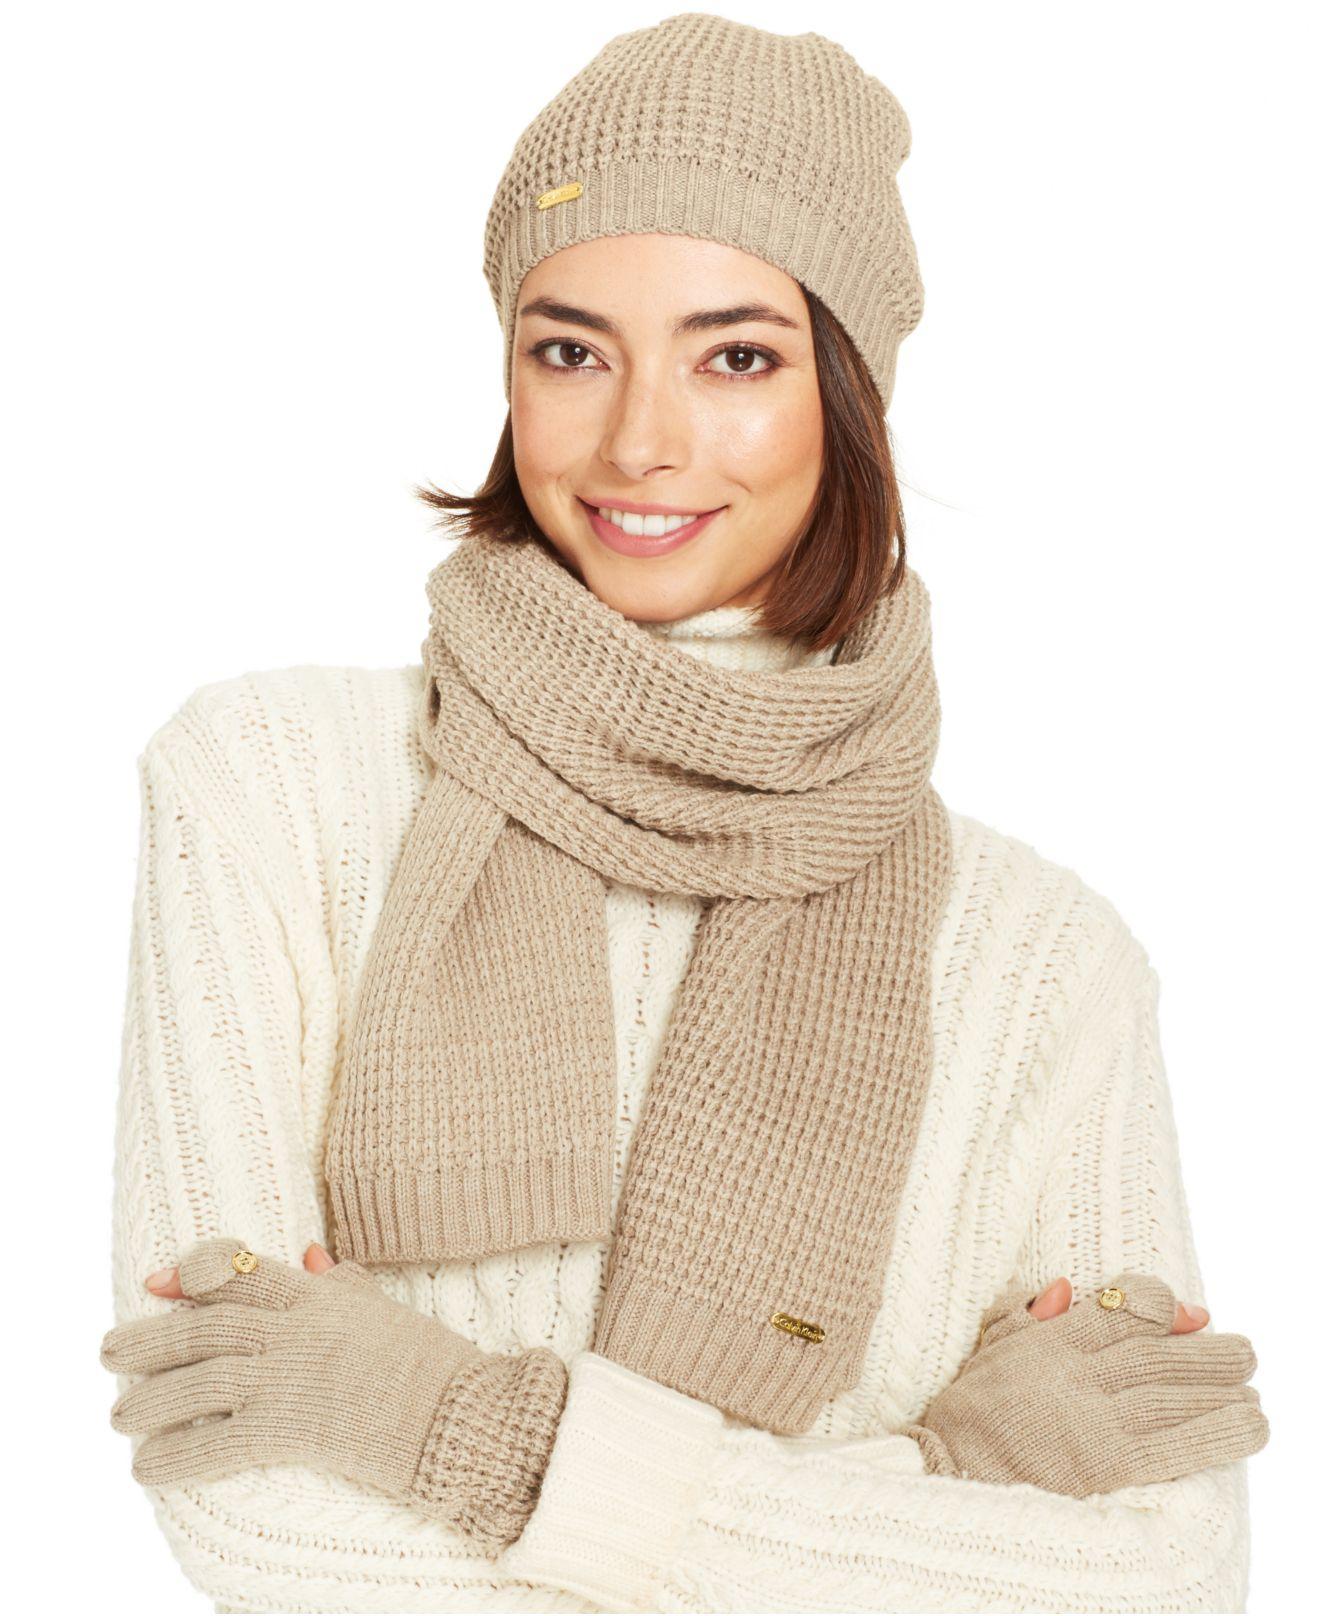 Lyst - Calvin Klein Texting Gloves   Scarf Set in Natural 2061a3690dd